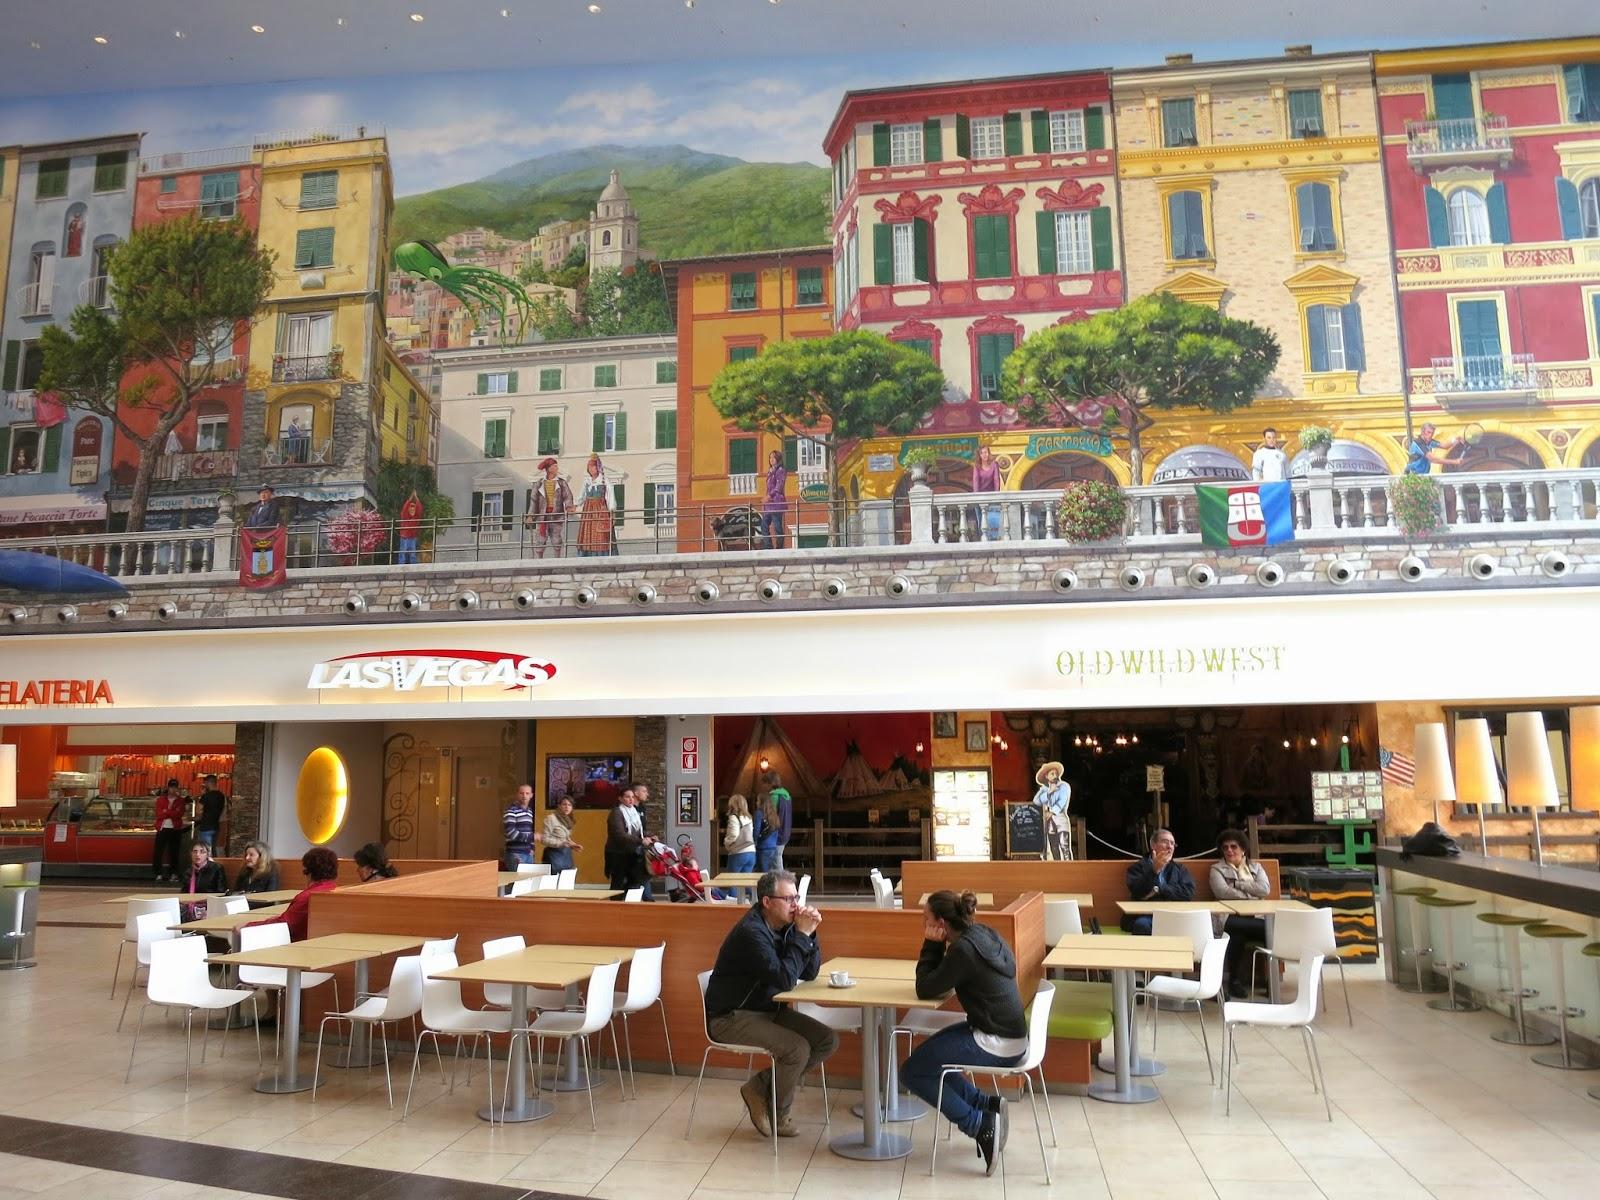 A Path To Lunch: A Ligurian Photo Album